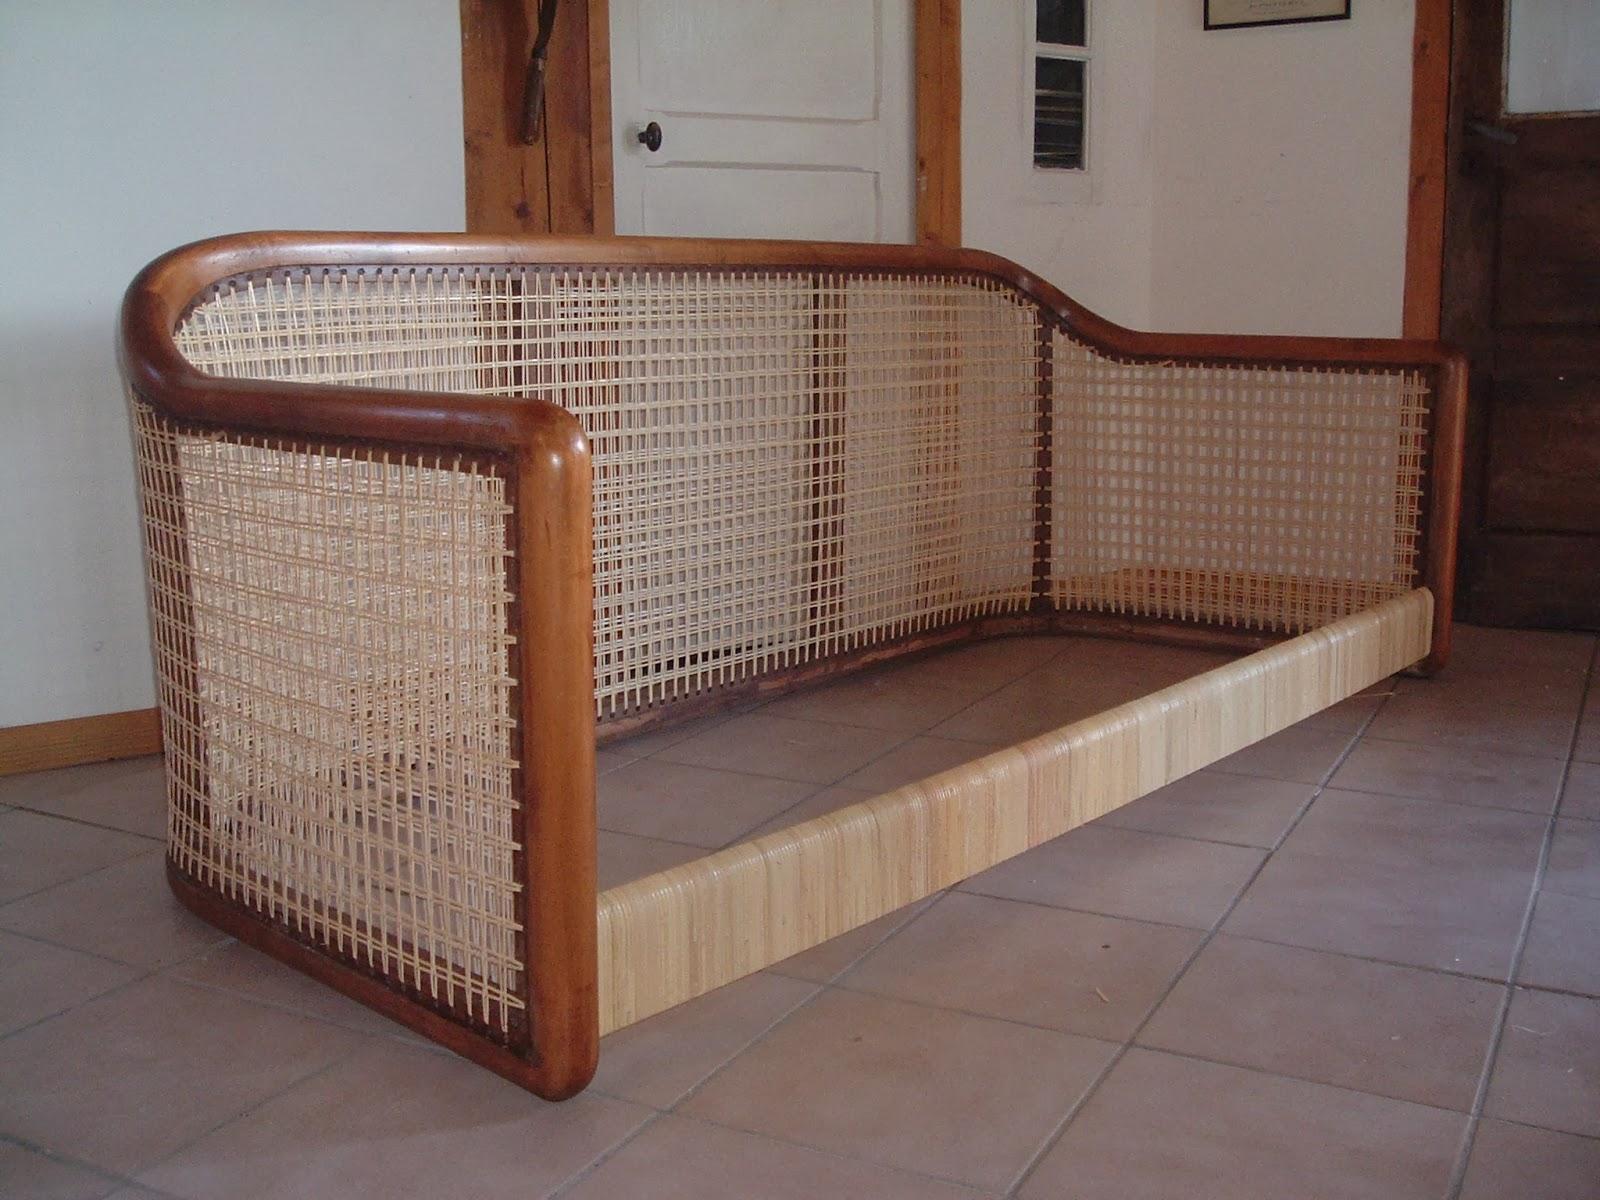 cannage rempaillage chaise tarif prix. Black Bedroom Furniture Sets. Home Design Ideas